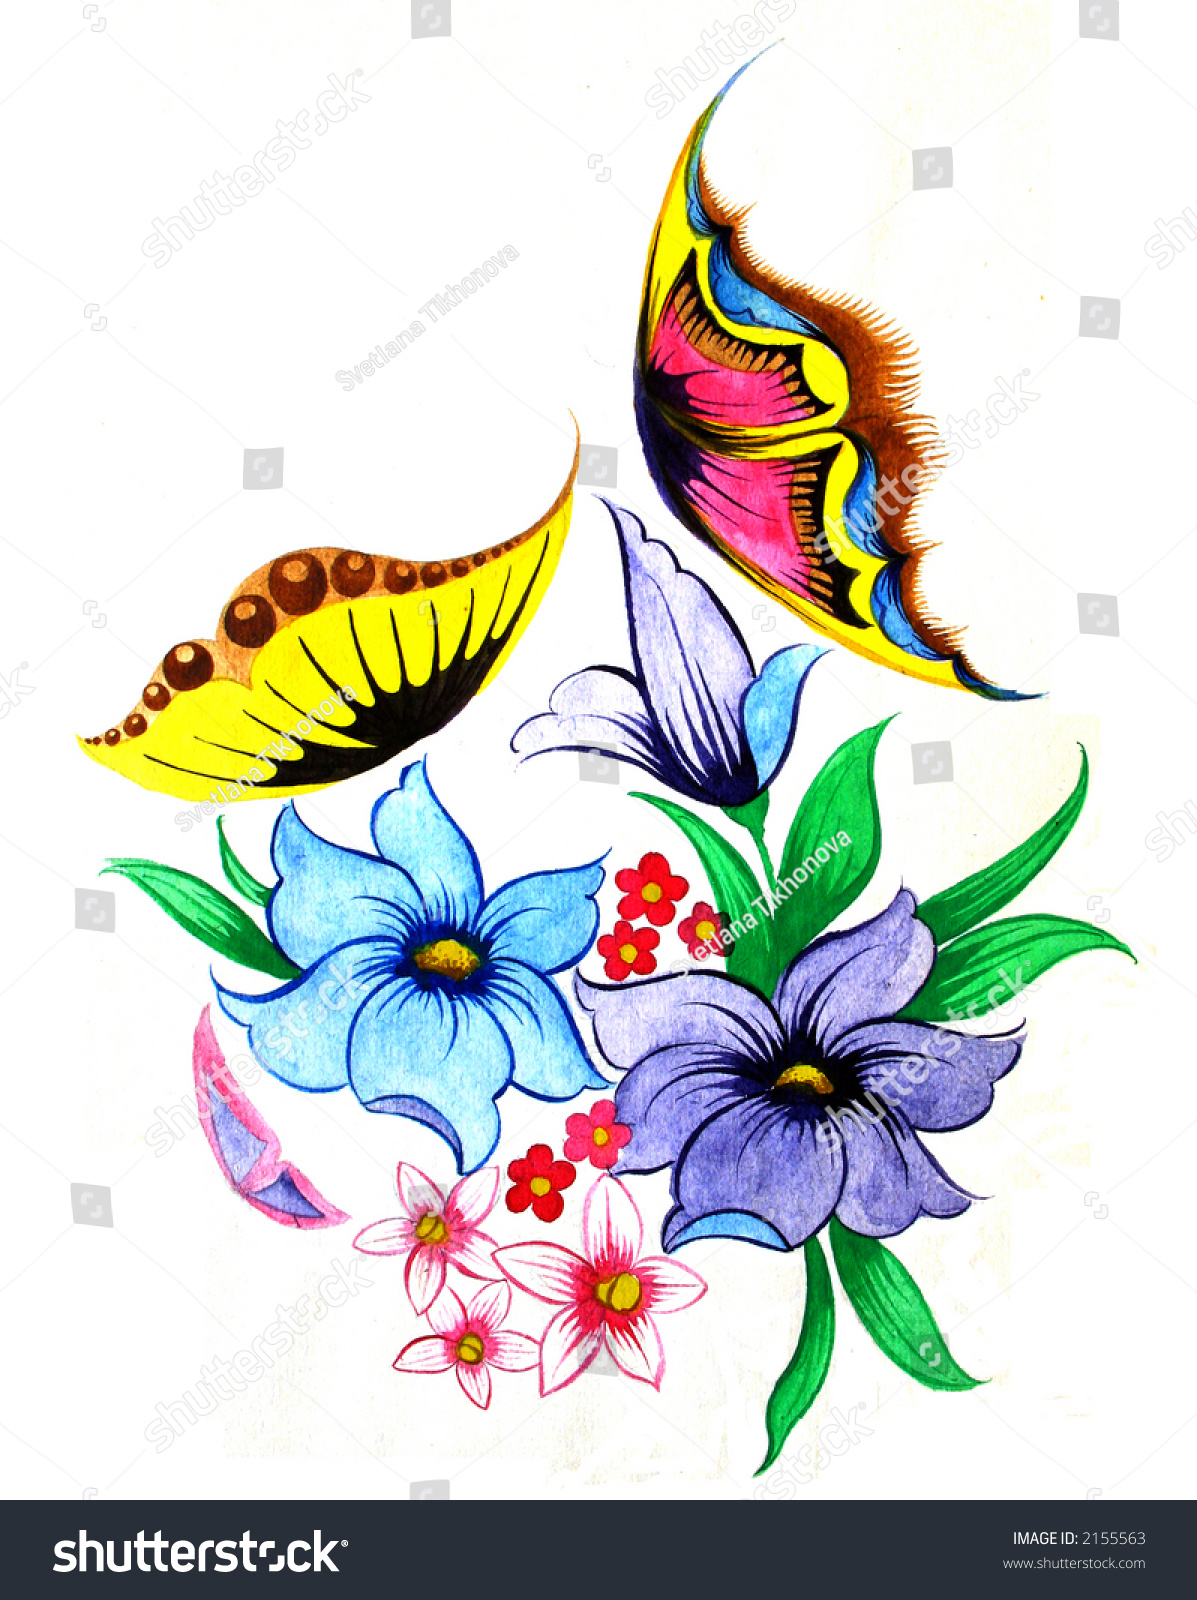 flowers butterflies scan original drawing stock photo 2155563